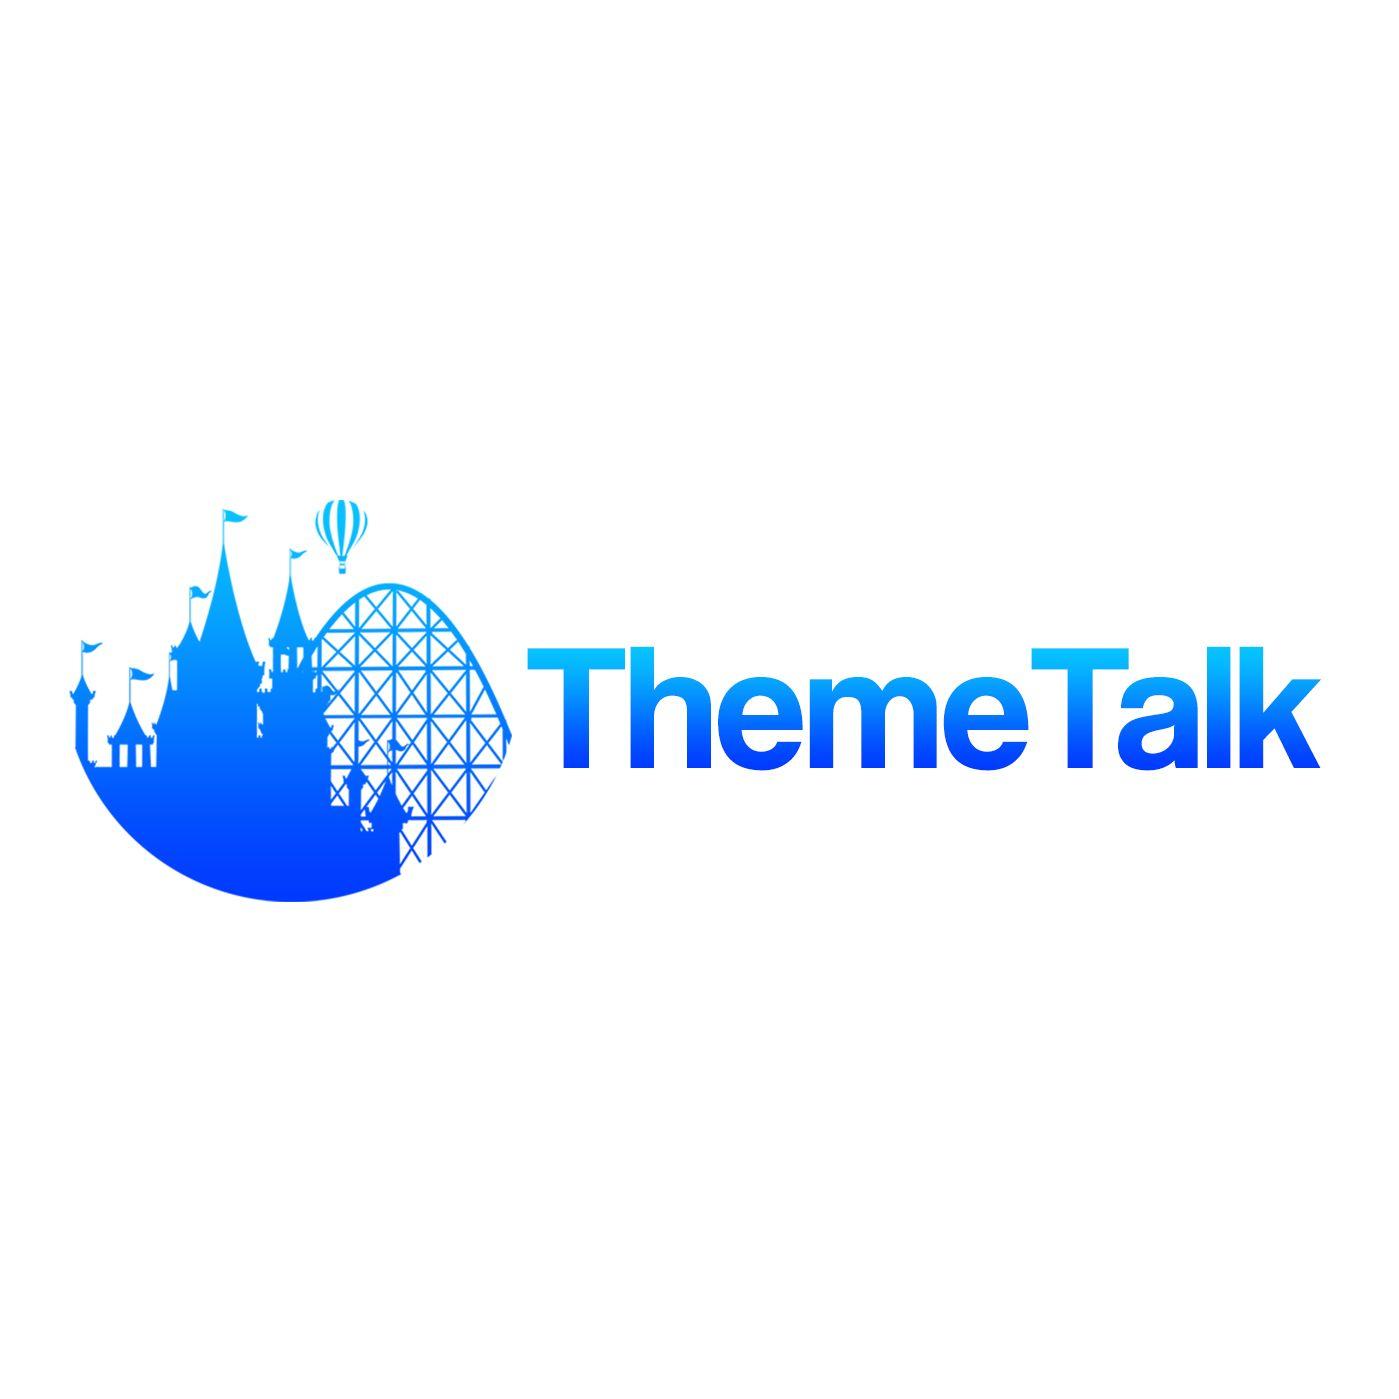 ThemeTalk logo